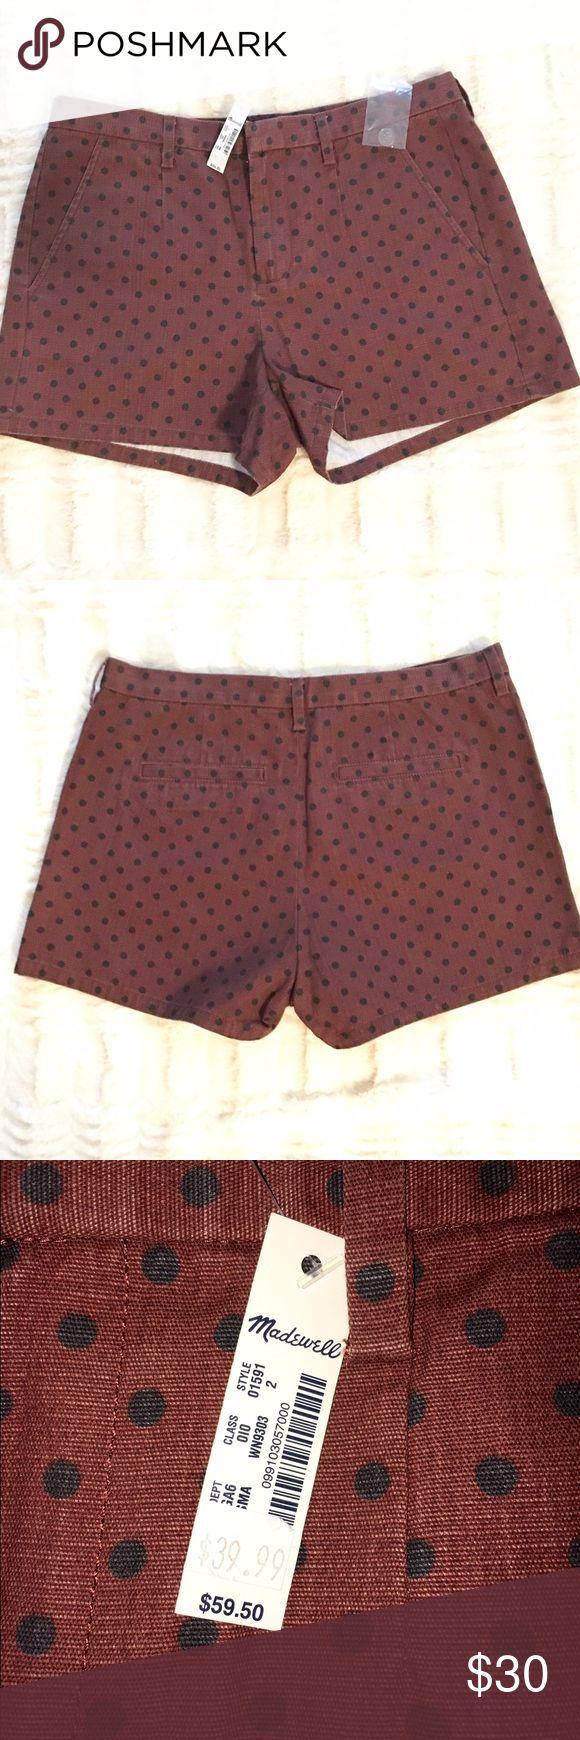 Madewell Maroon and Black Polka Dot Shorts - NWT Brand new with tags maroon with black polka dots shorts from Madewell. Madewell Shorts